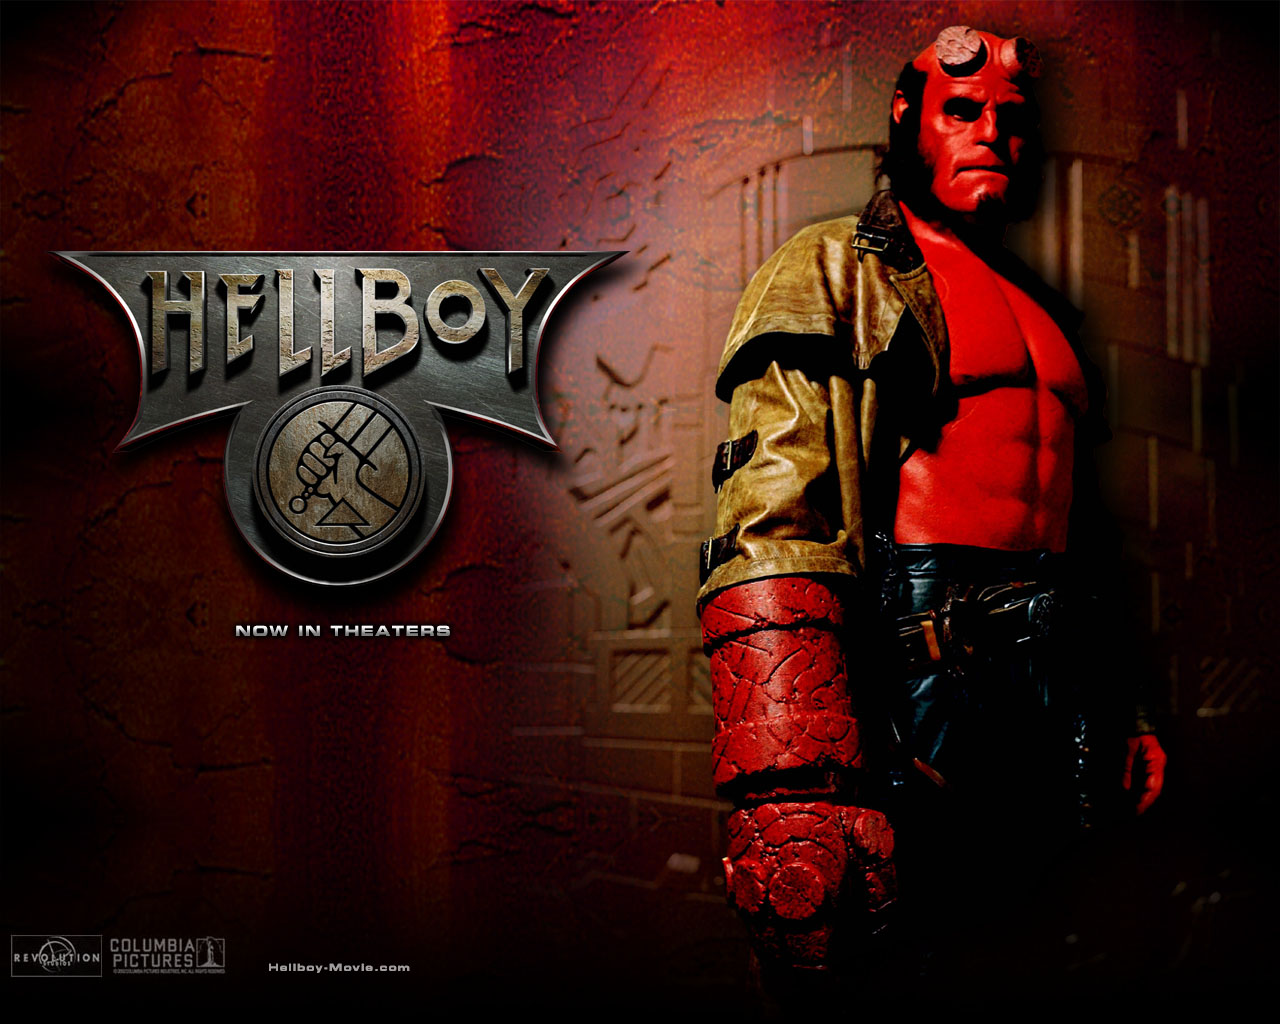 Hellboy phone wallpaper